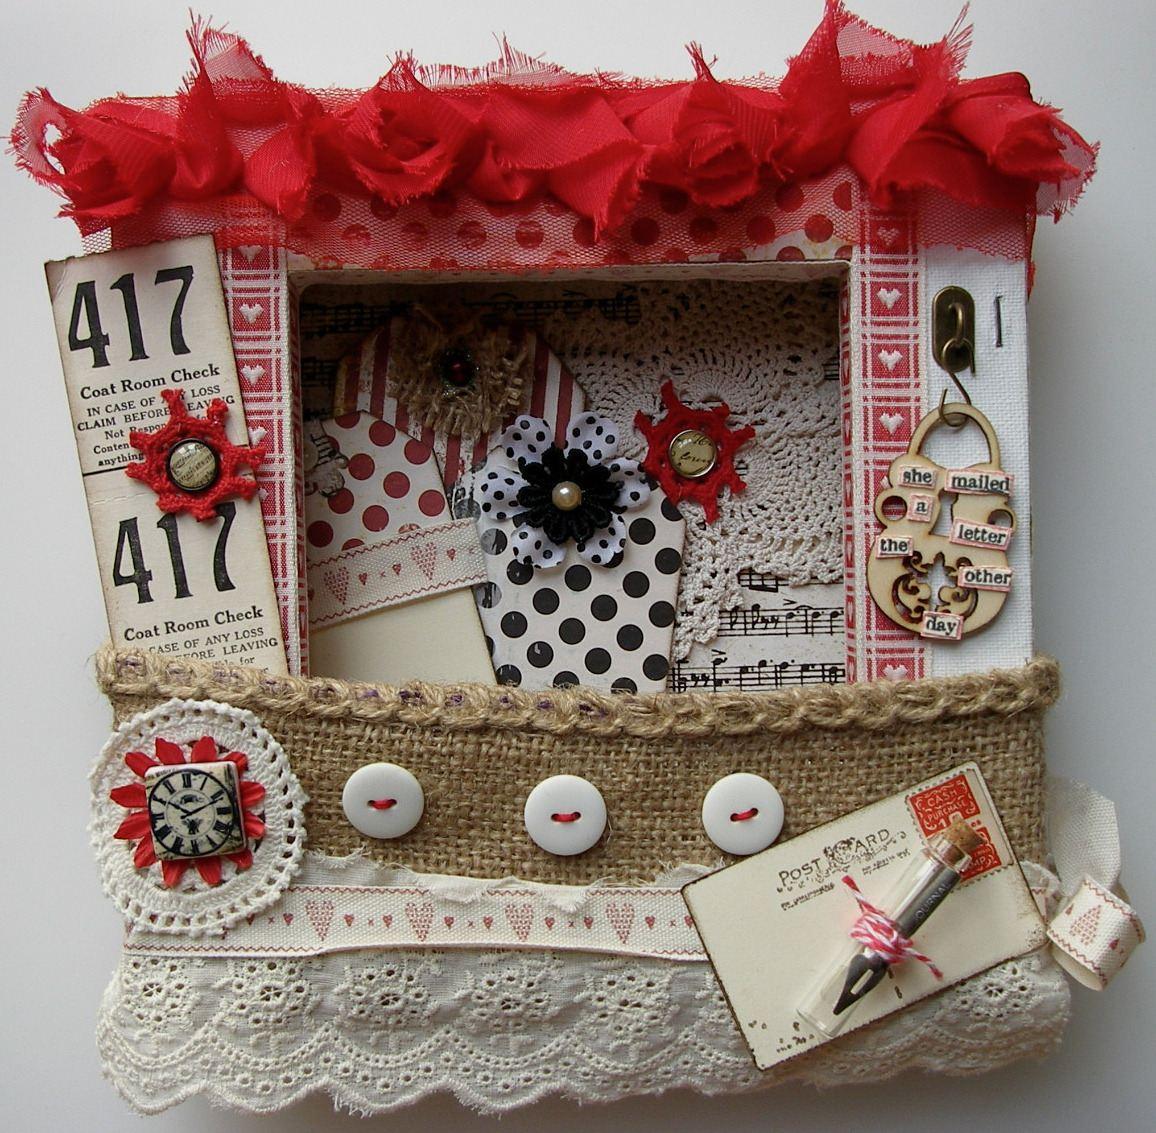 *she mailed a letter* OOAK Handmade Altered Canvas Love Letter Holder